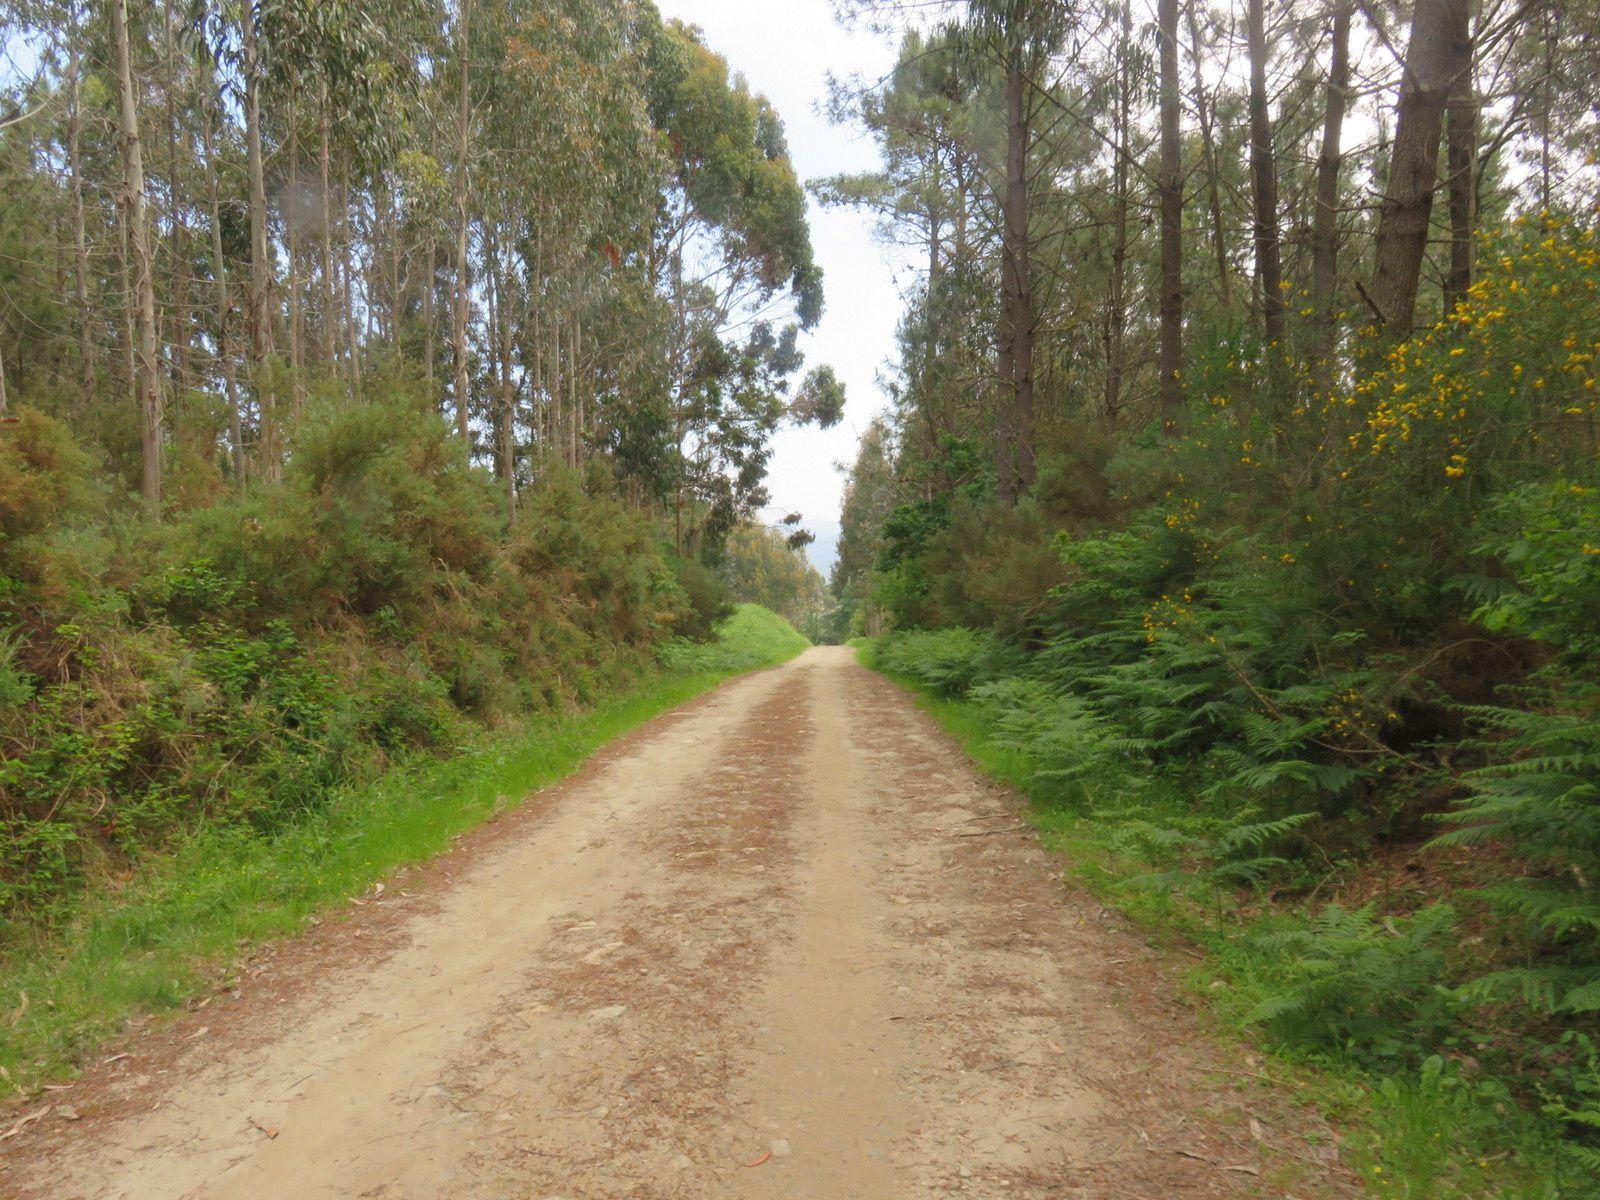 VENDREDI 25 MAI 2018: ETAPE 22 DU JEUDI 24 MAI: LIRES - MUXIA 15 km